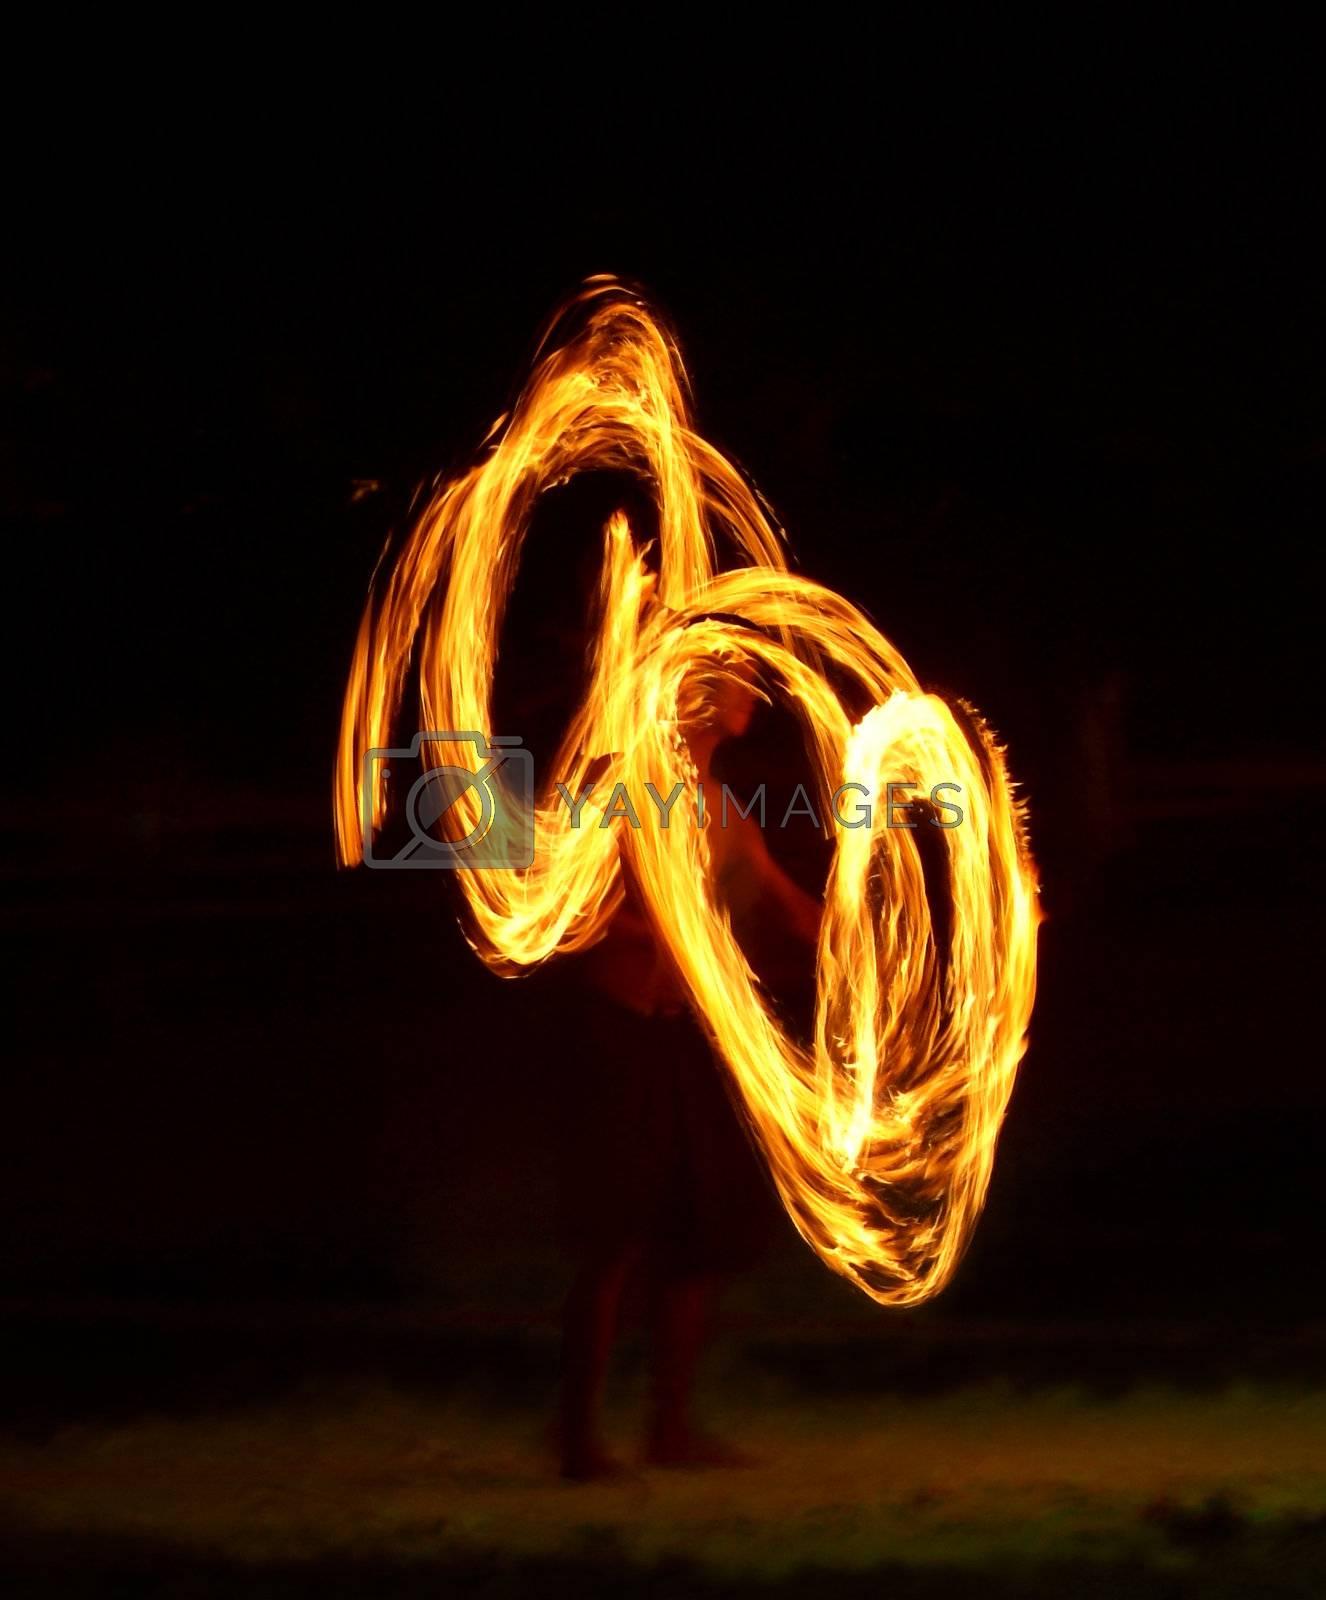 Flame juggler by epixx